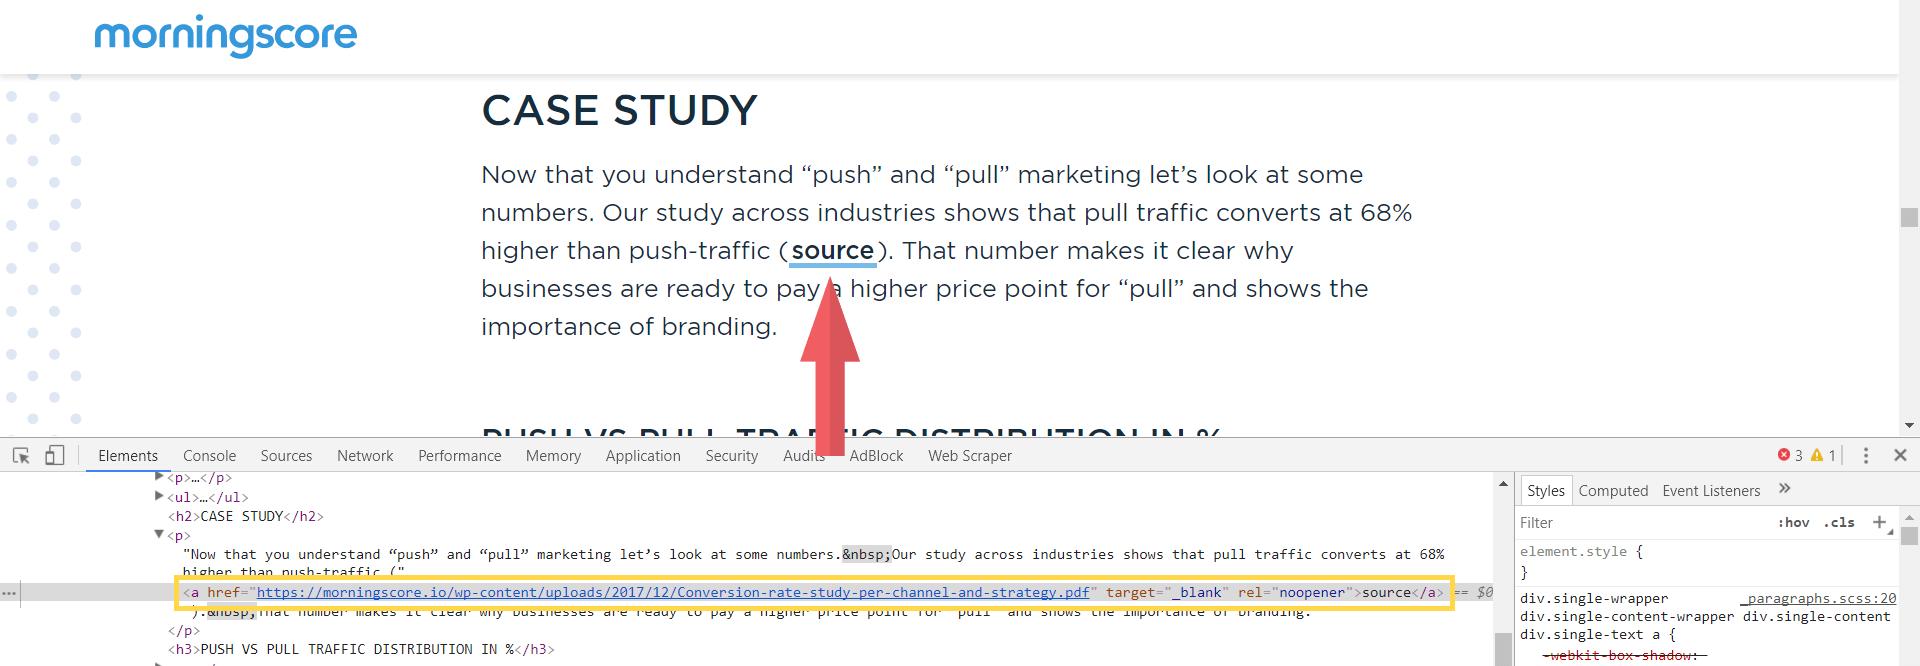 morningscore case study backlinks example